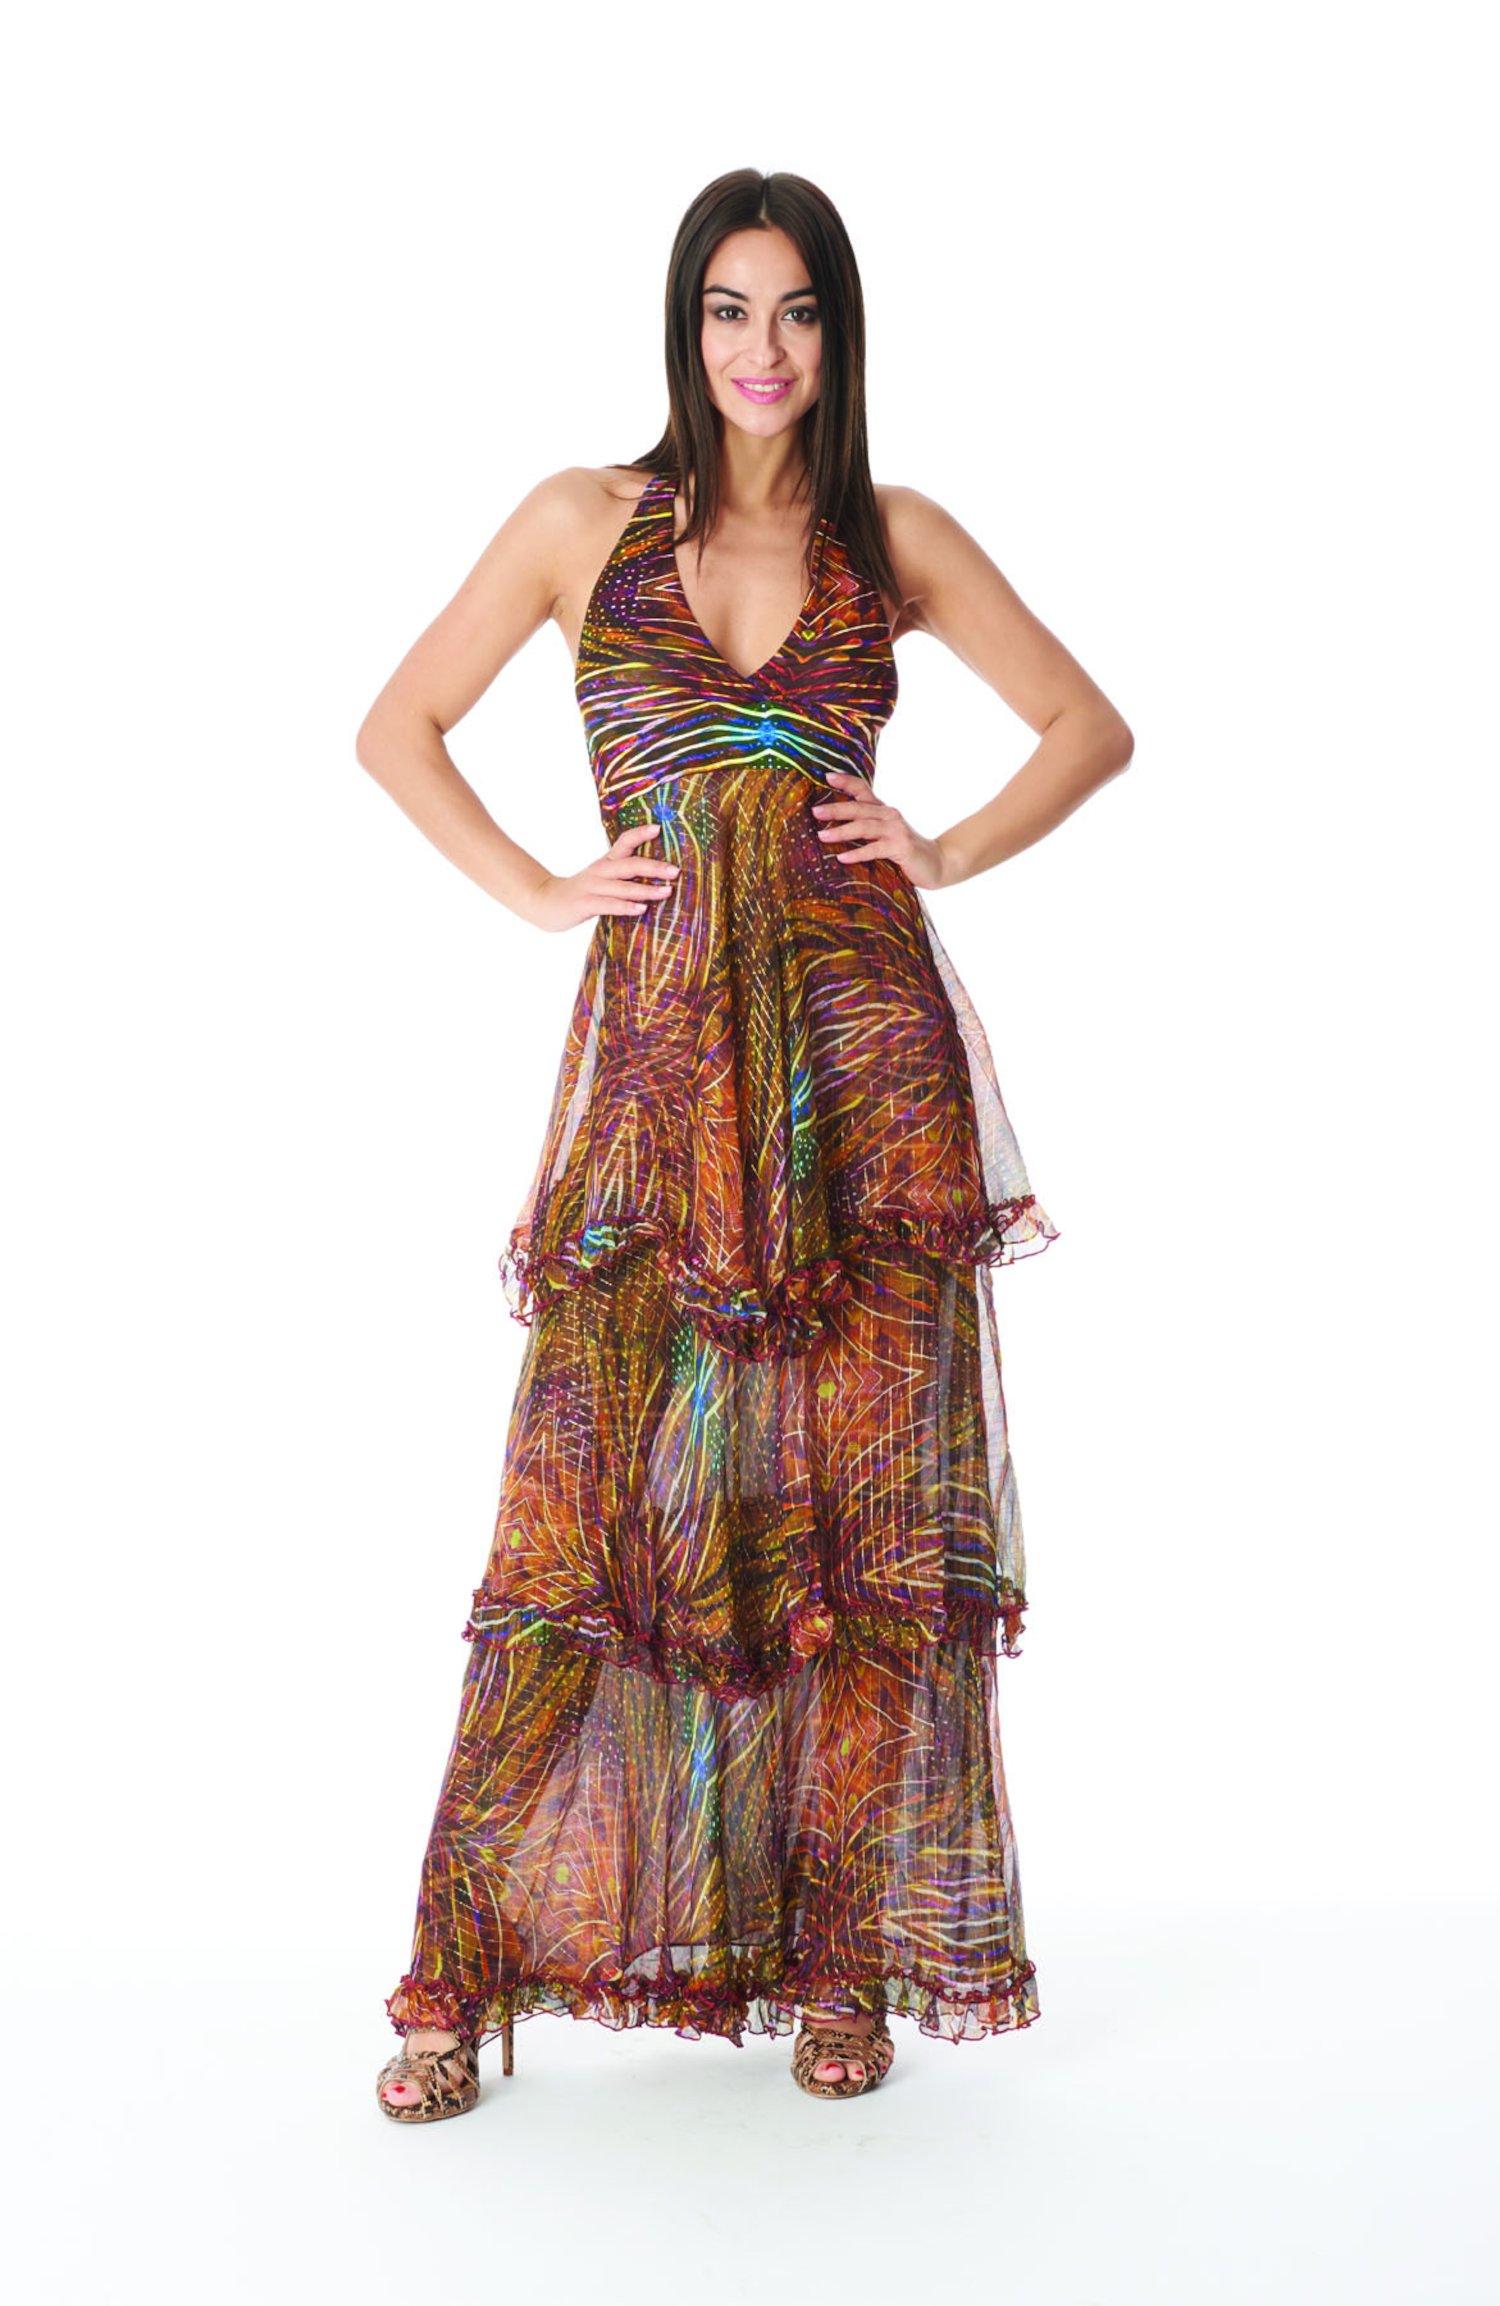 LONG DRESS SILK LUREX - Plumage Ambra